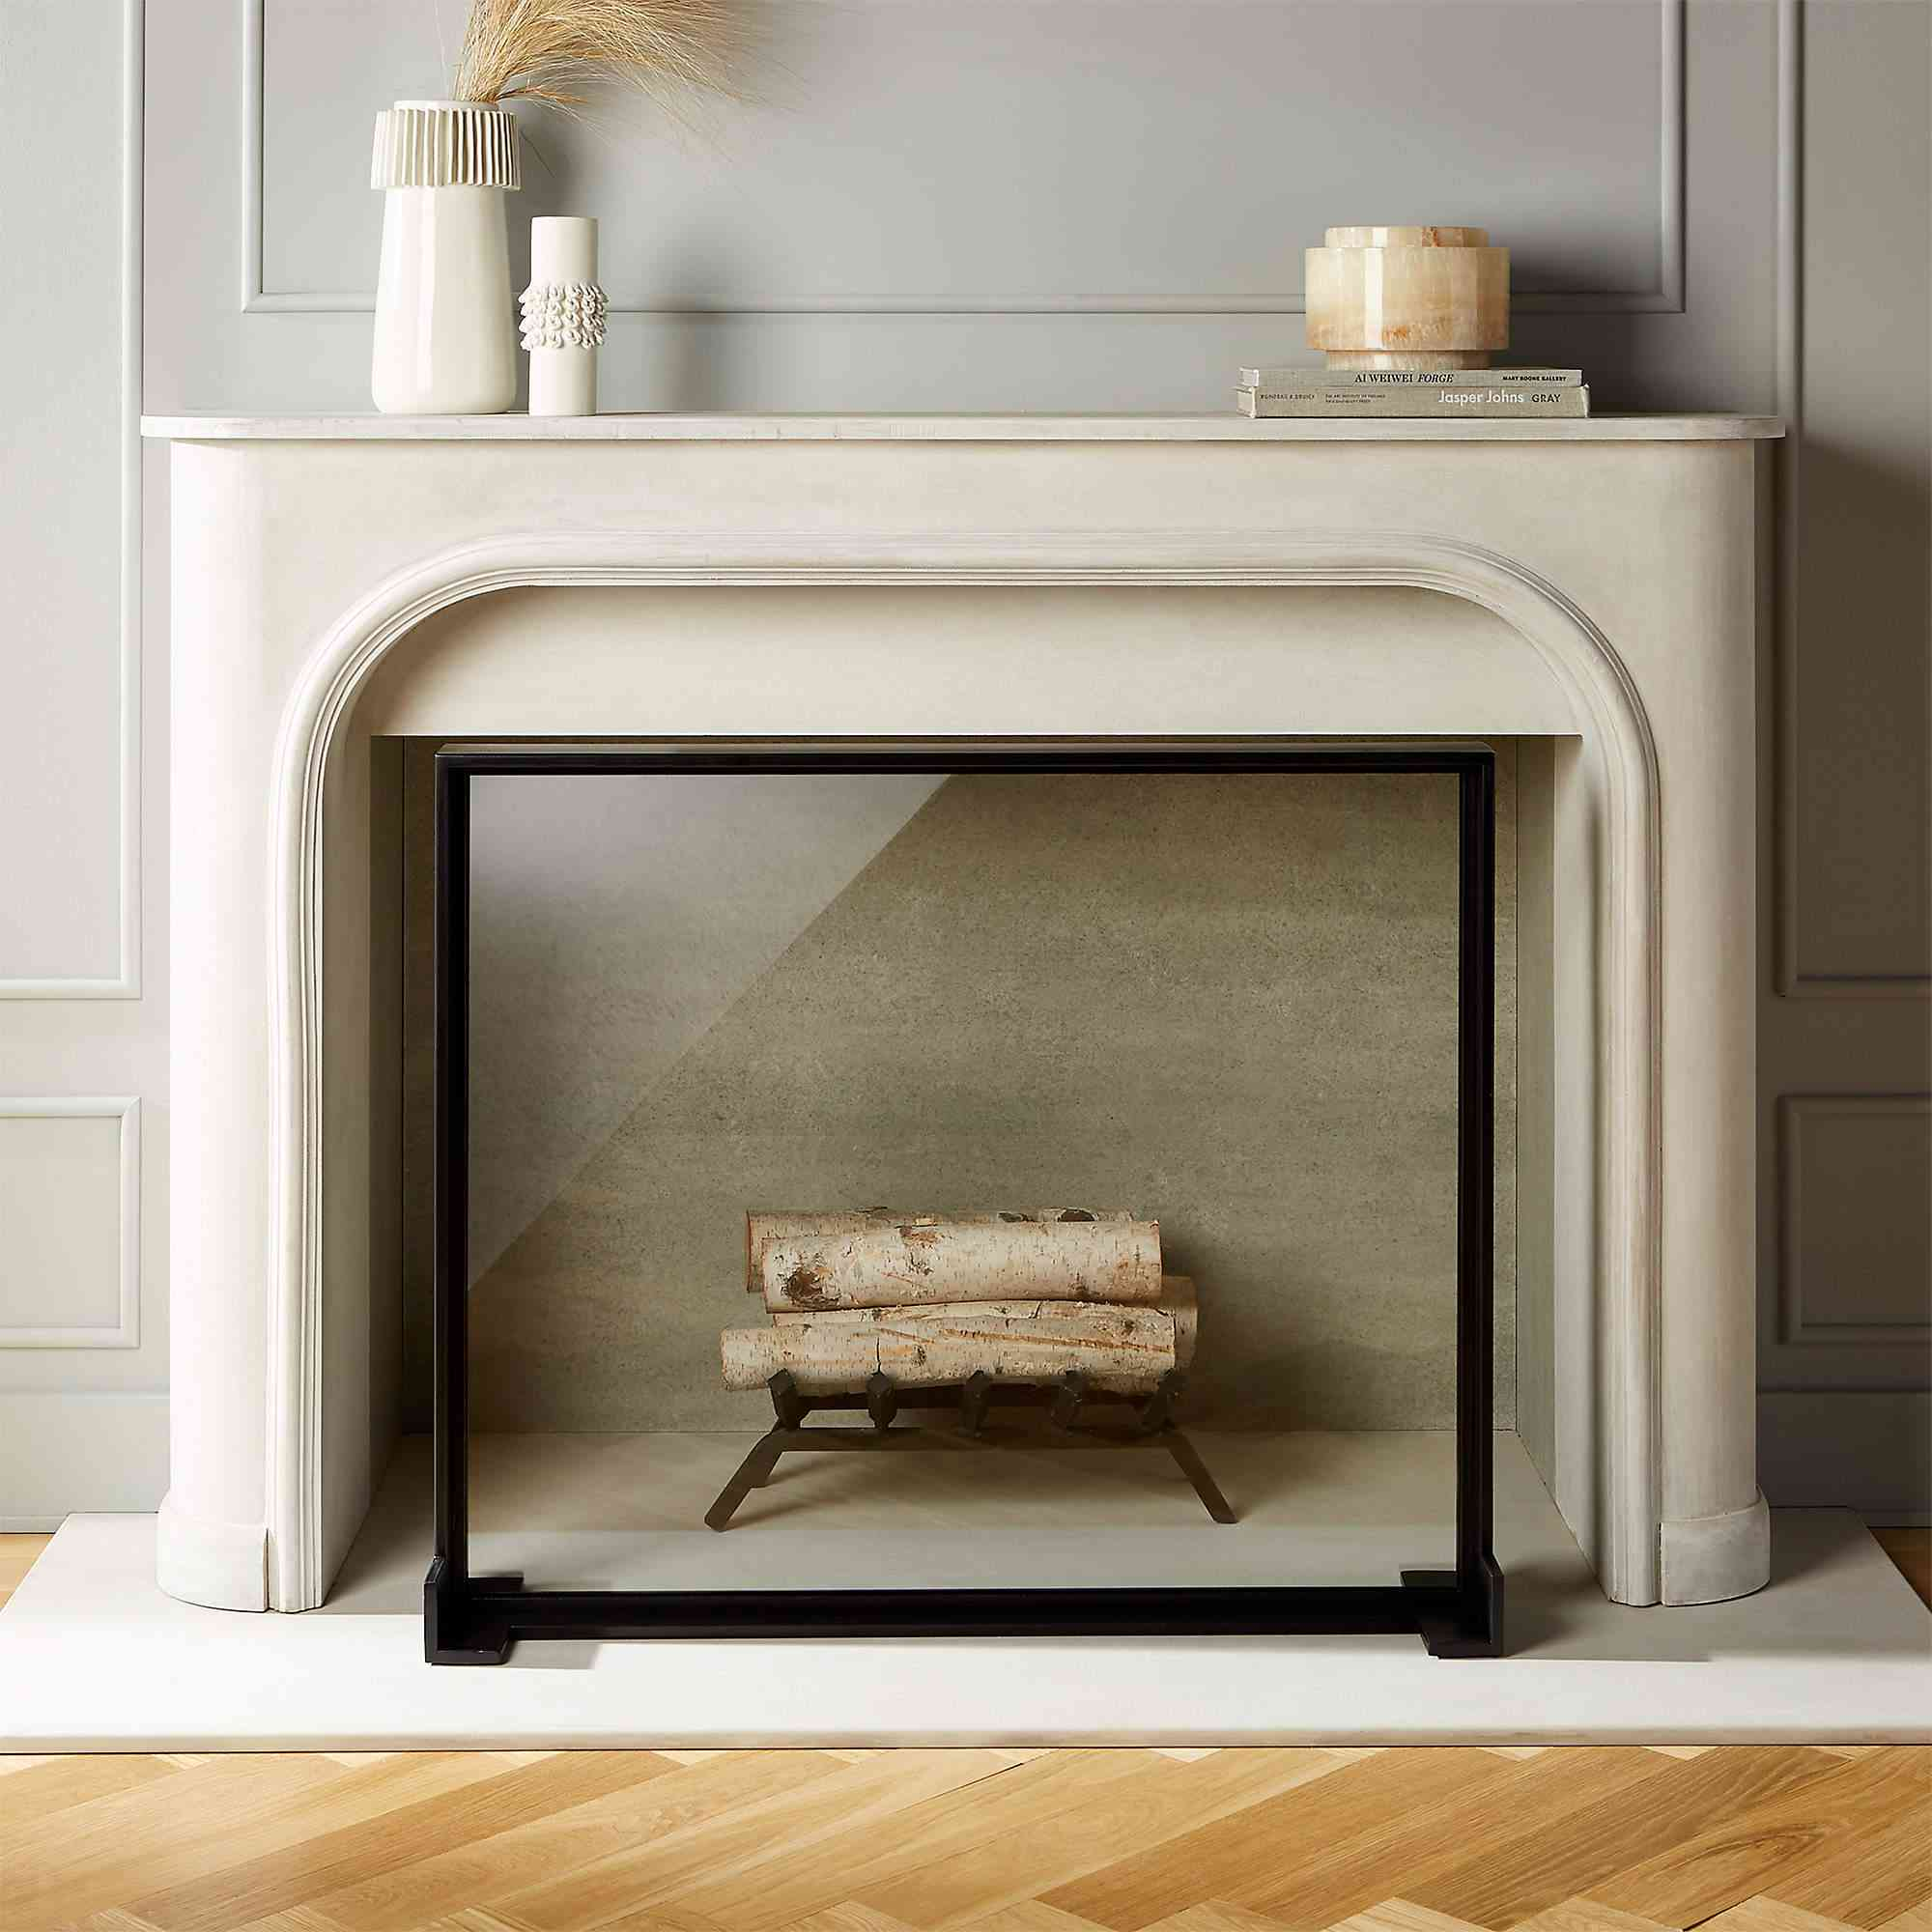 CB2 Ledge Glass Fireplace Screen